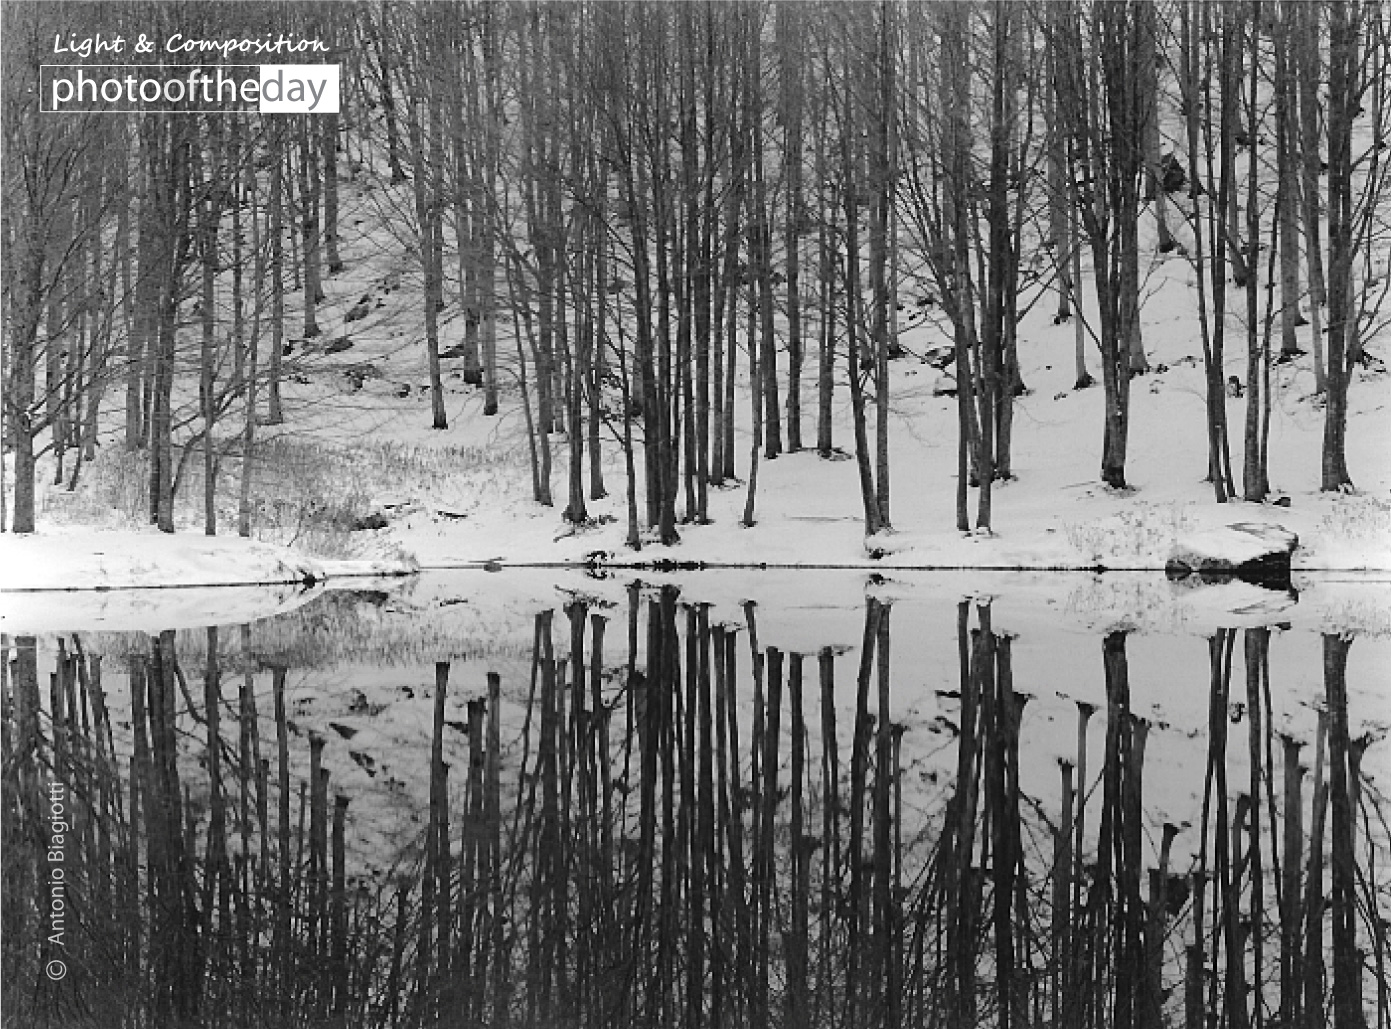 Reflections by Antonio Biagiotti